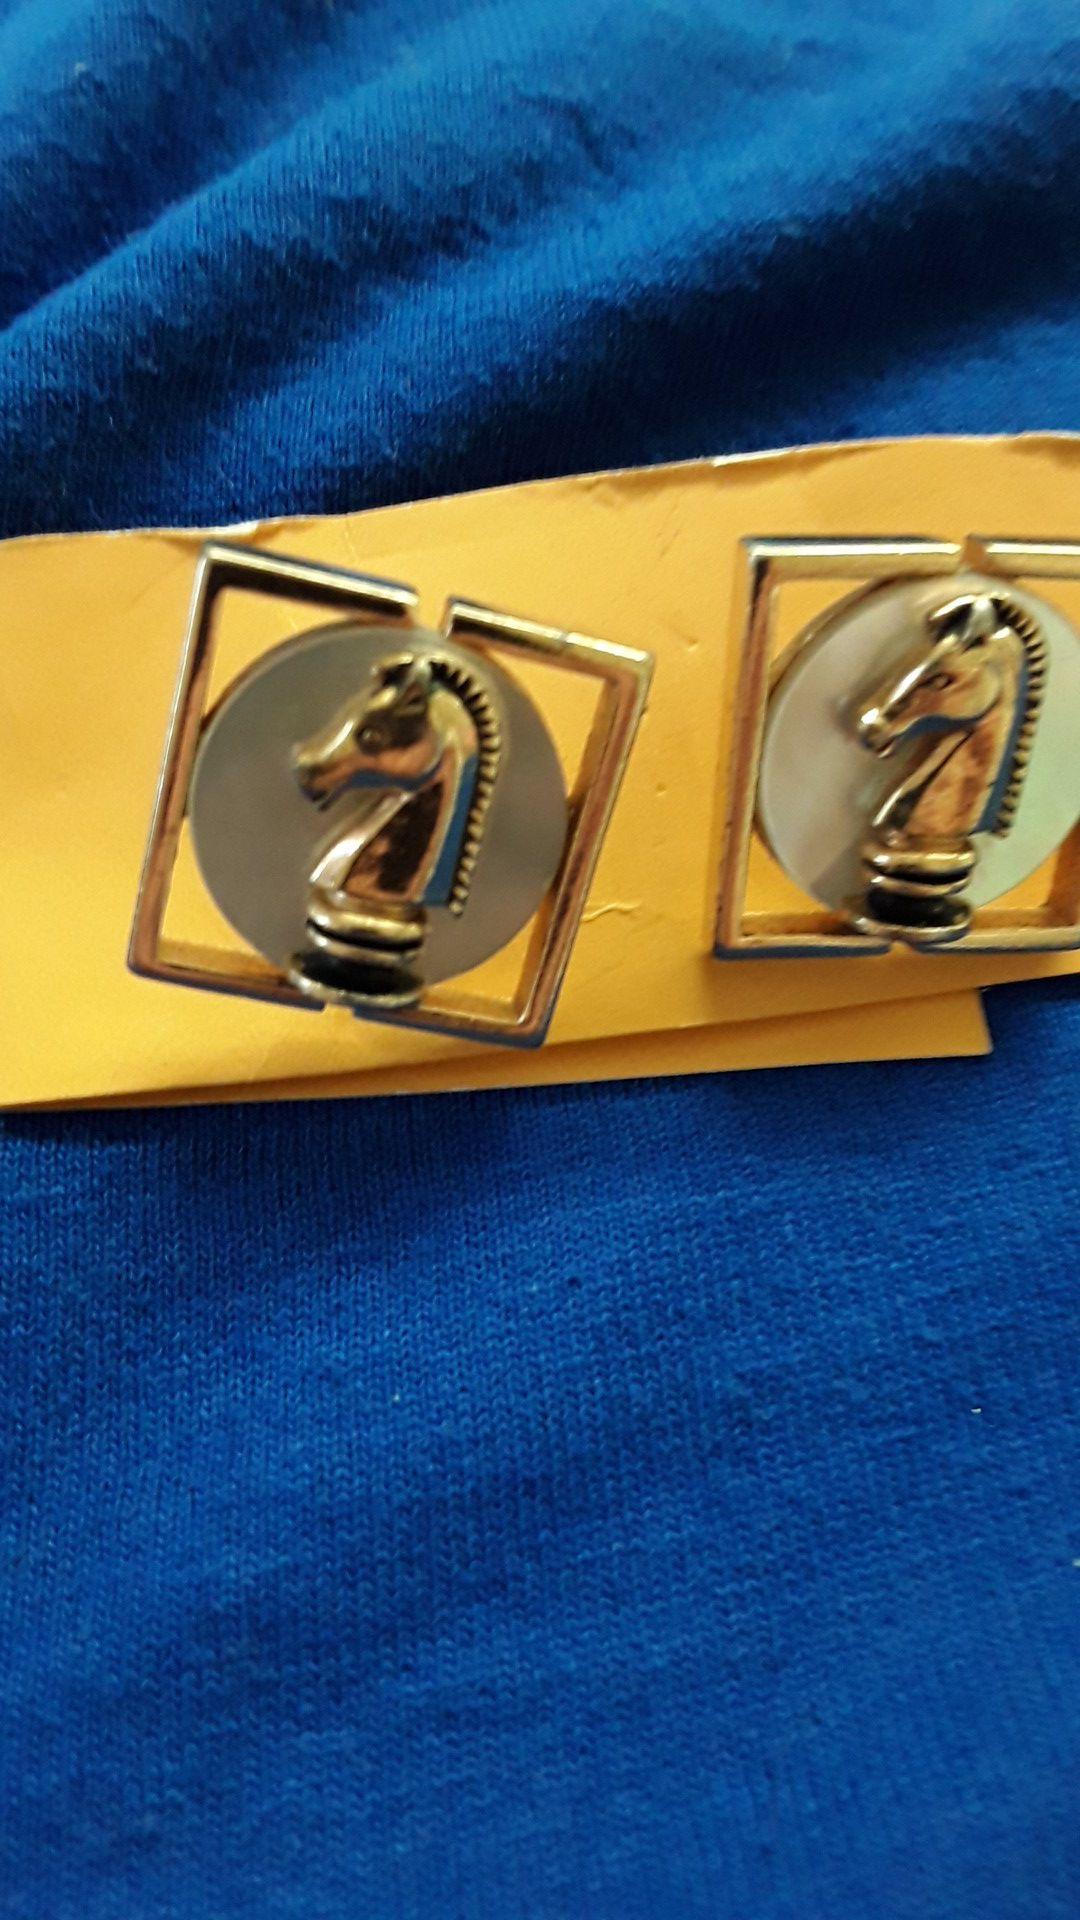 Vintage 1960s cuff links